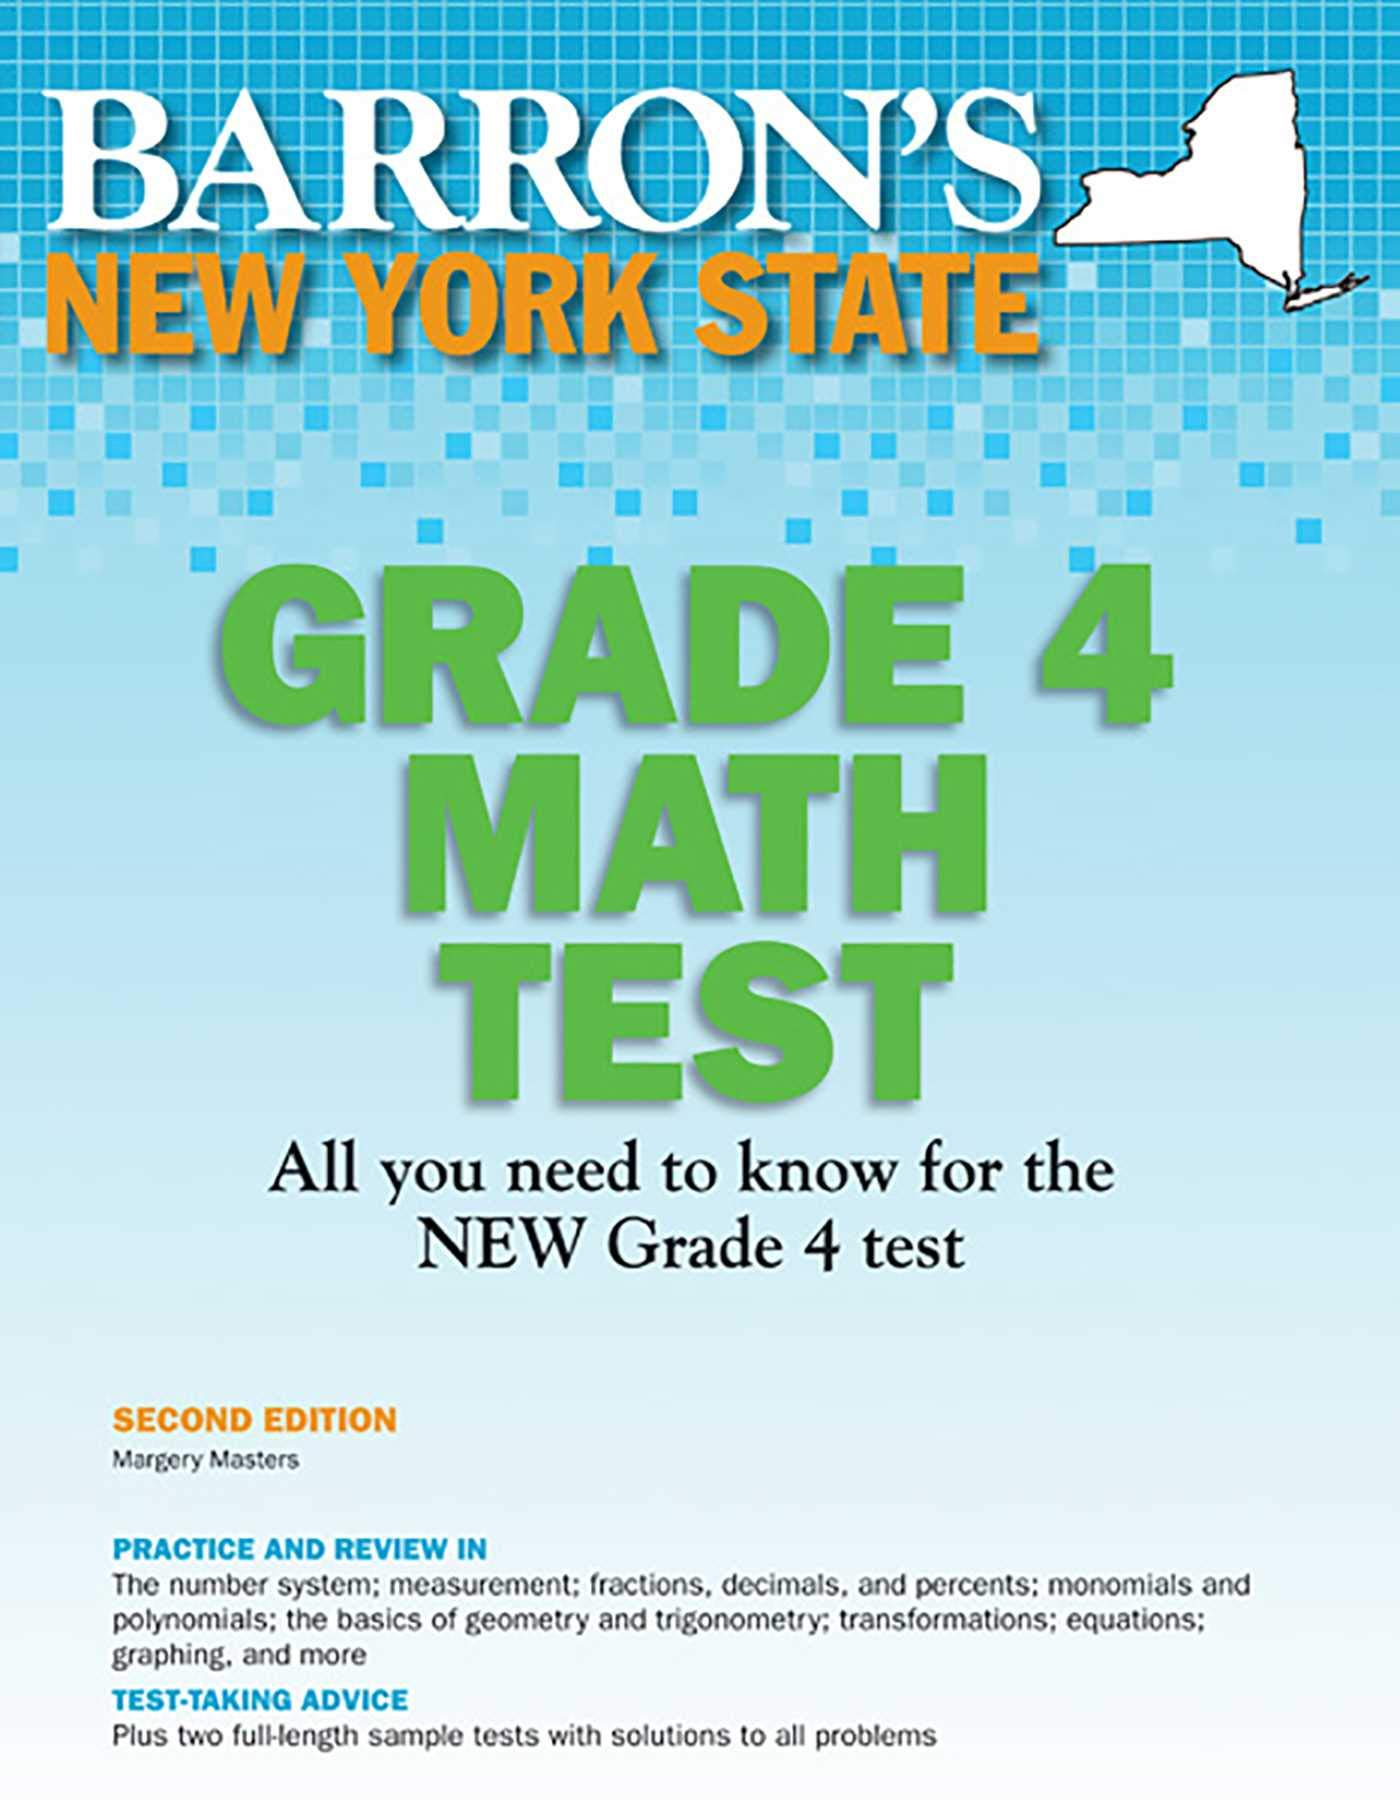 Download New York State Grade 4 Math Test (Barron's New York State Grade 4 Math Test) pdf